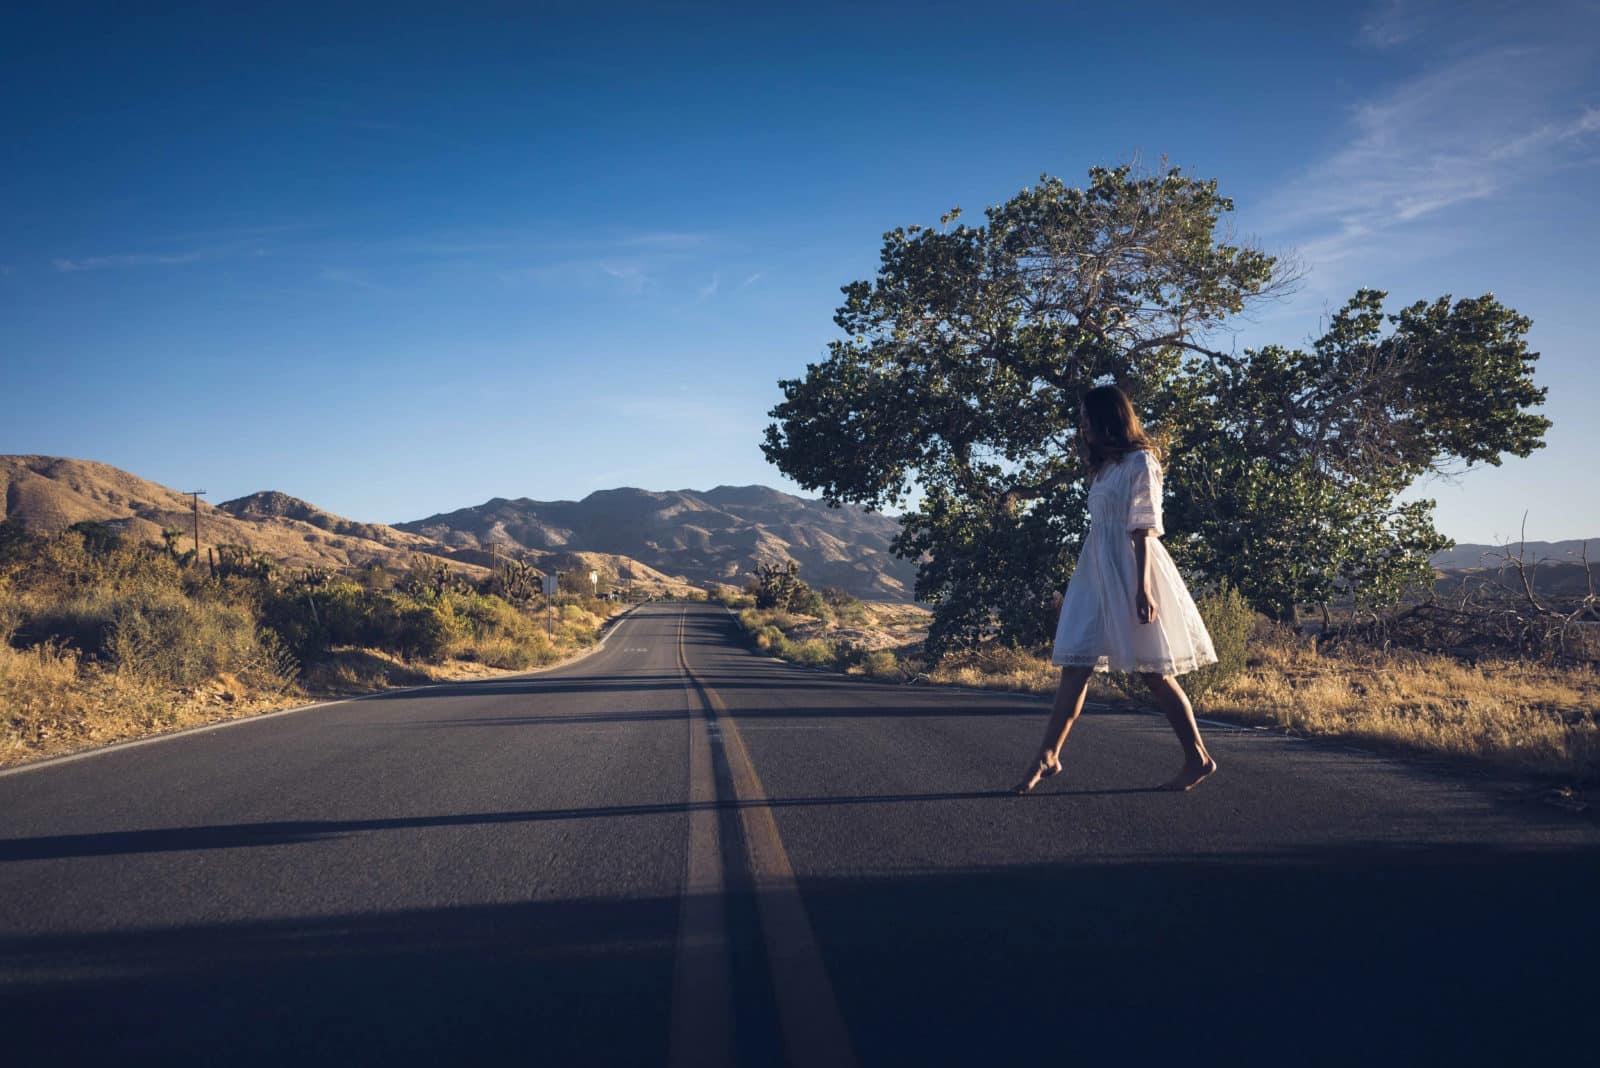 Girl walking across road